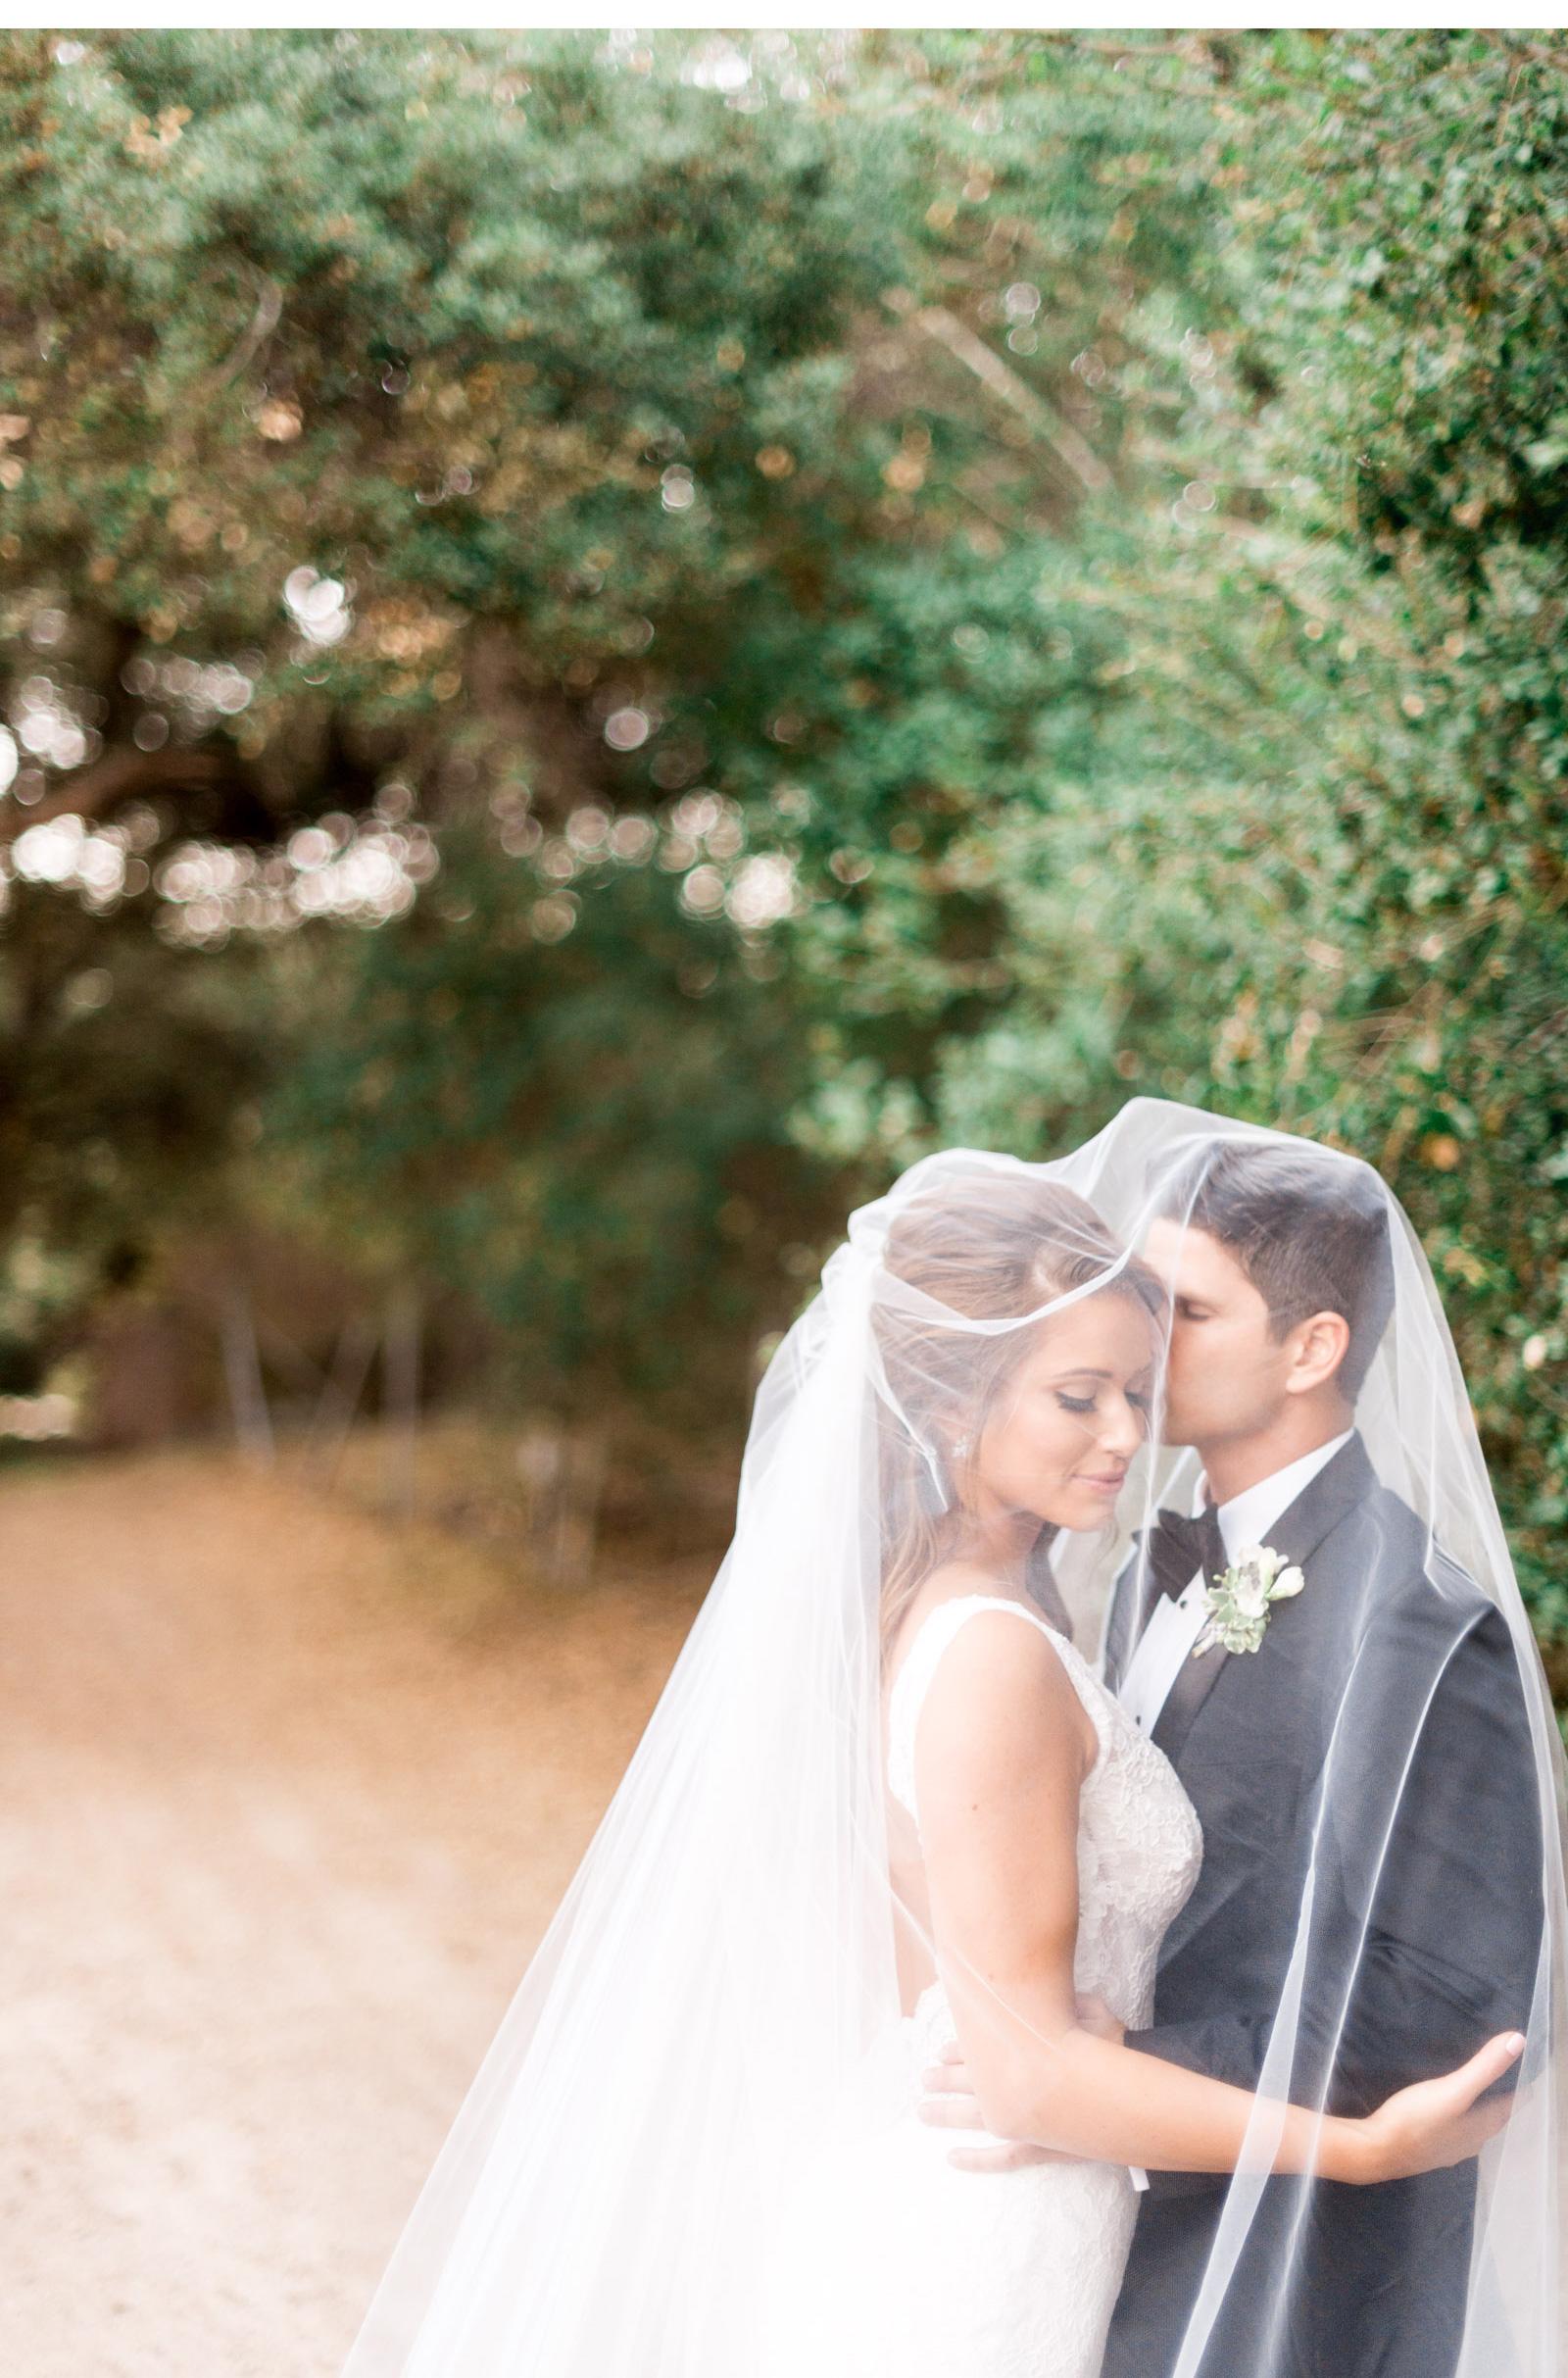 Nia-Sanchez-&-Daniel-Booko-Wedding-Natalie-Schutt-Photography_02.jpg